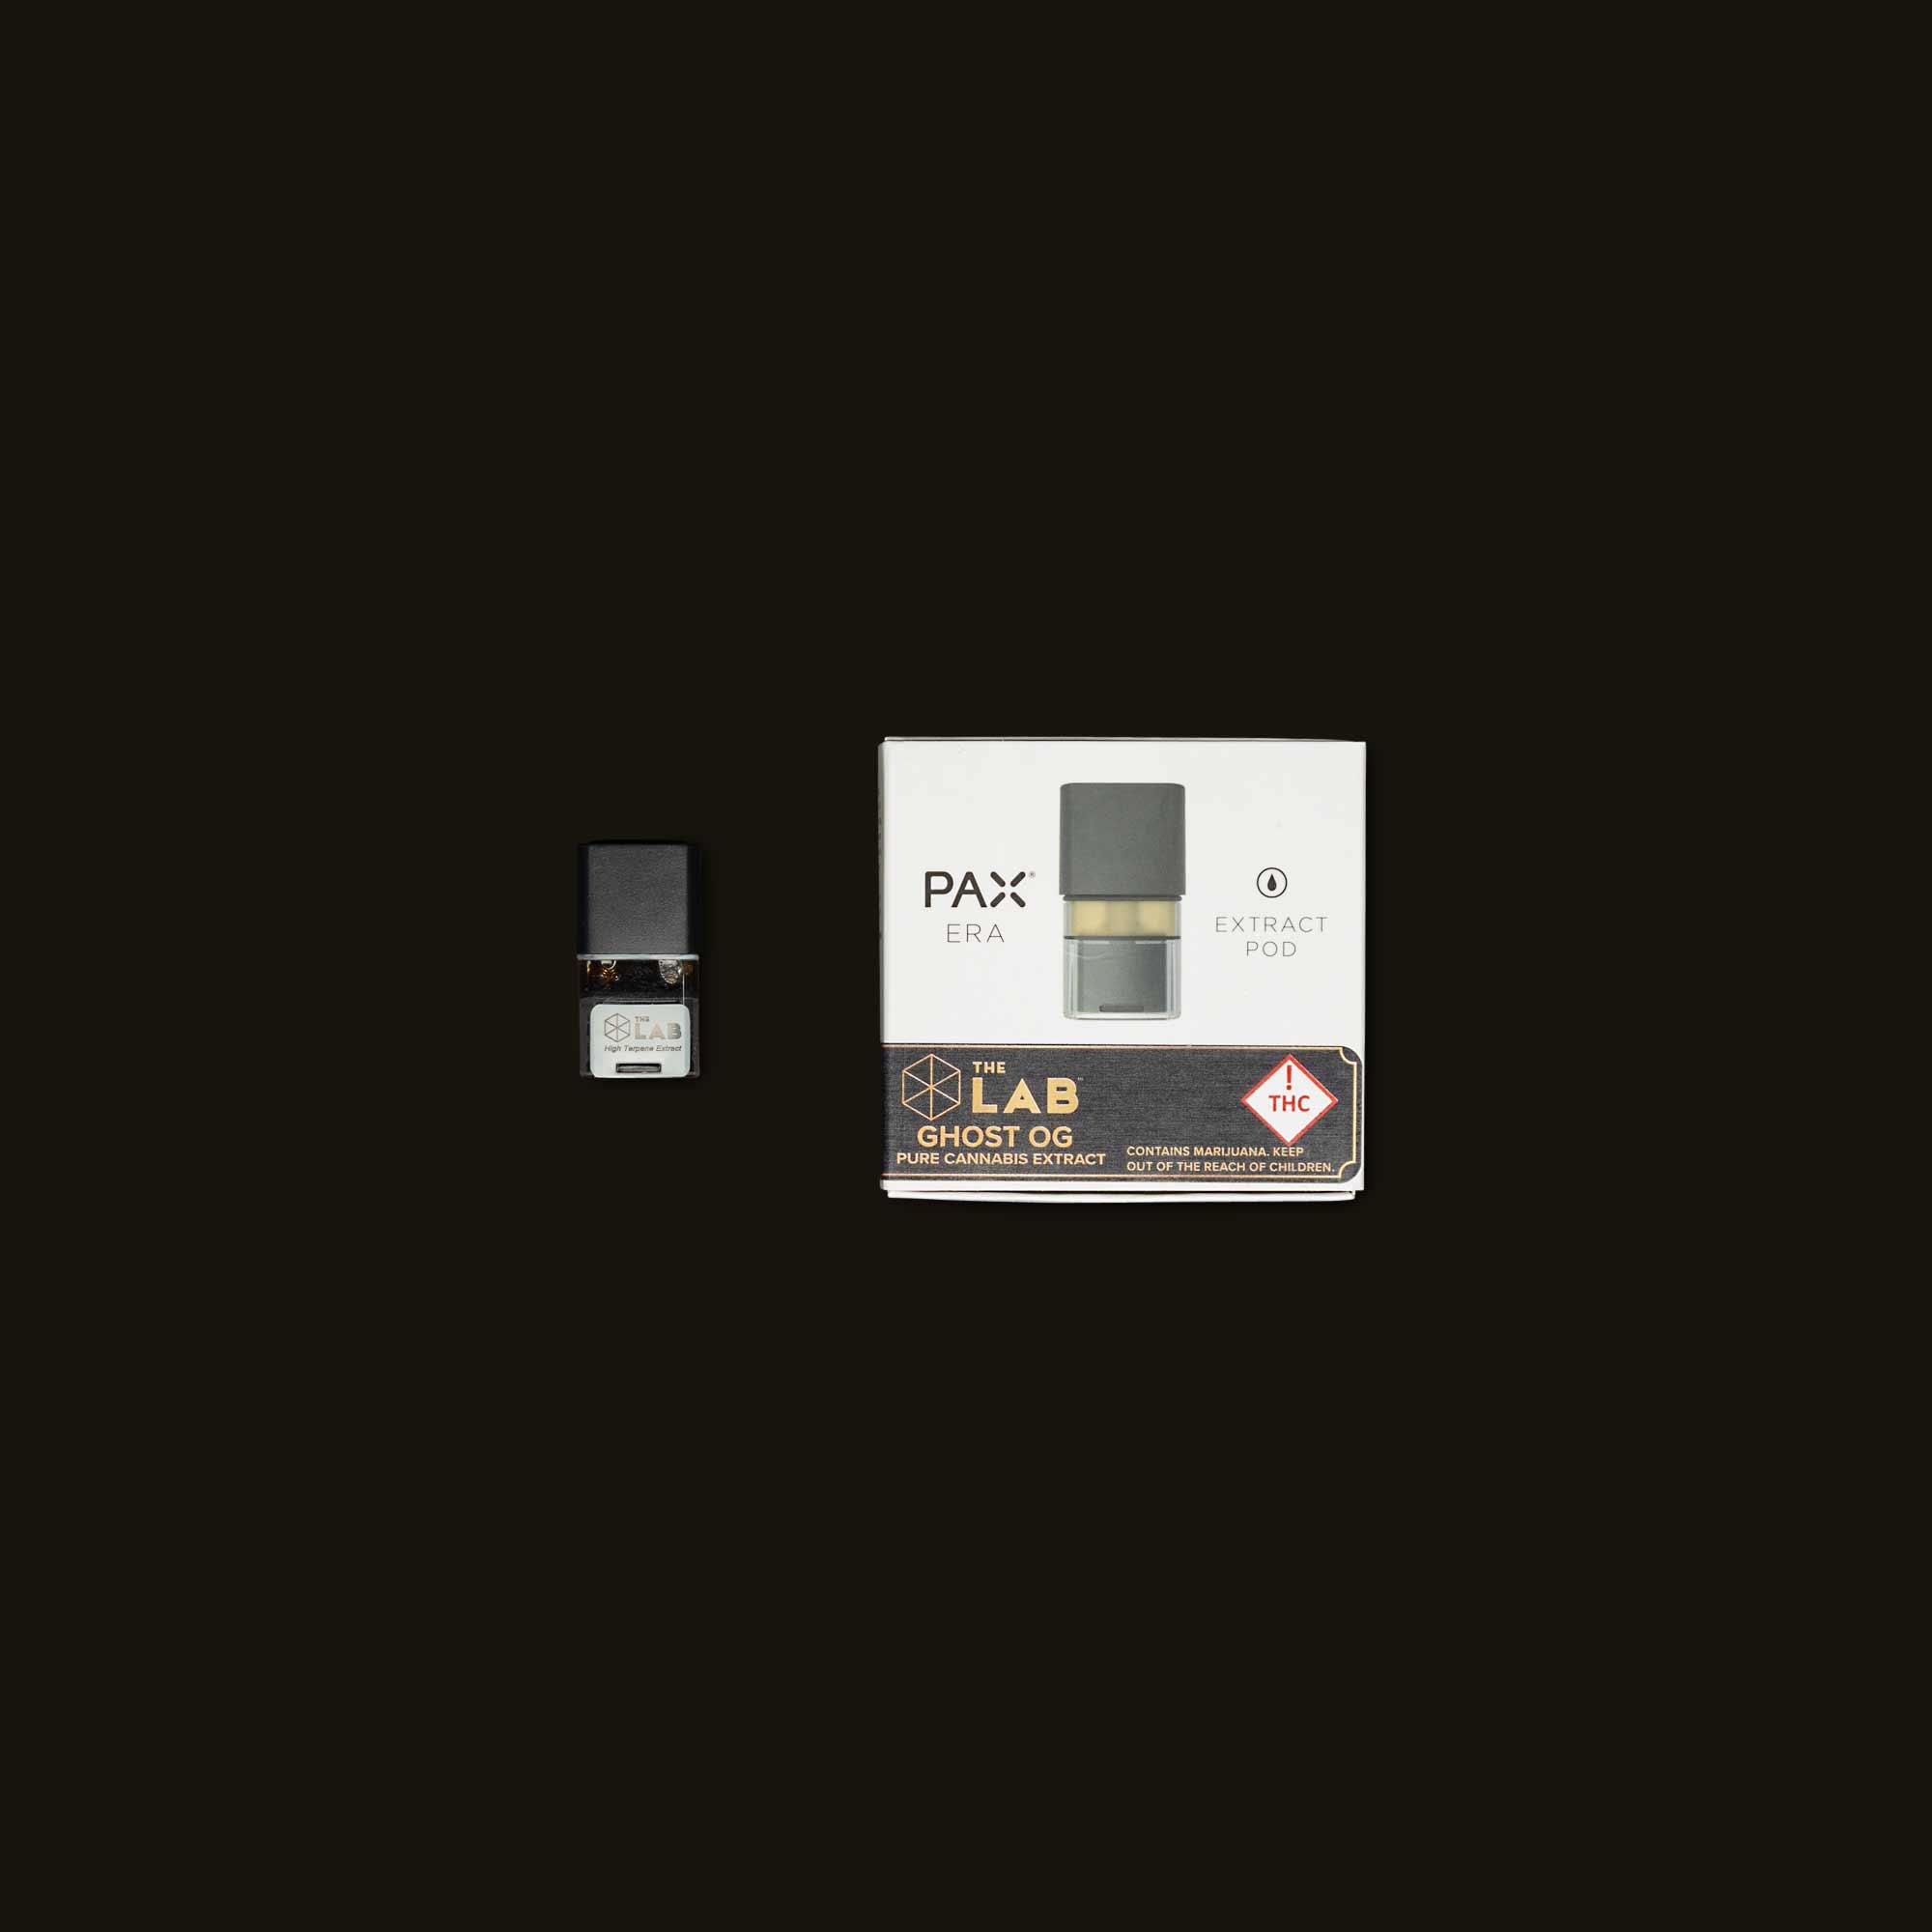 The Lab Ghost OG PAX Era Pod